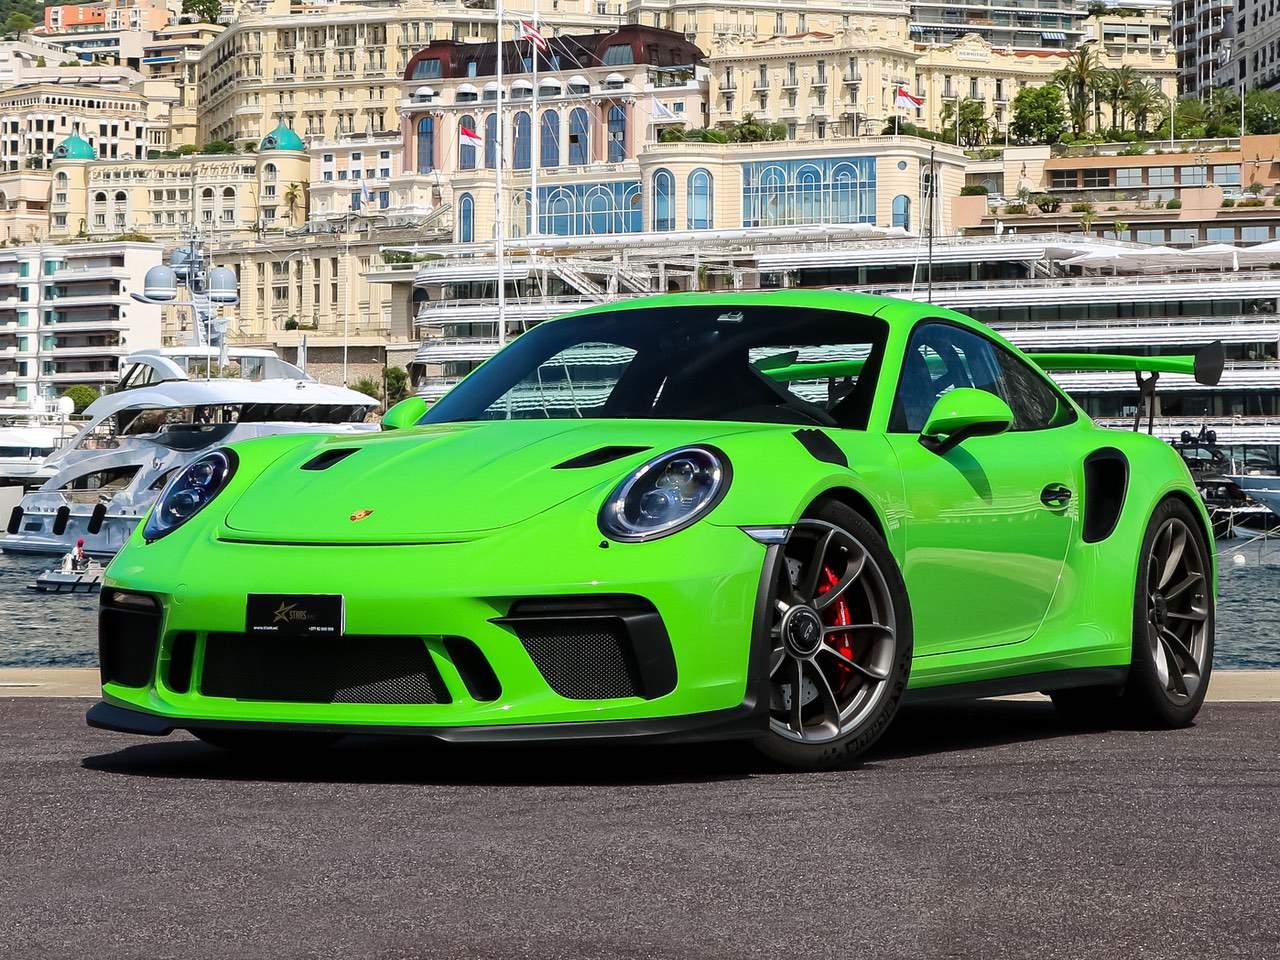 Porsche-911-Coupè-991-GT3-RS-PDK-6